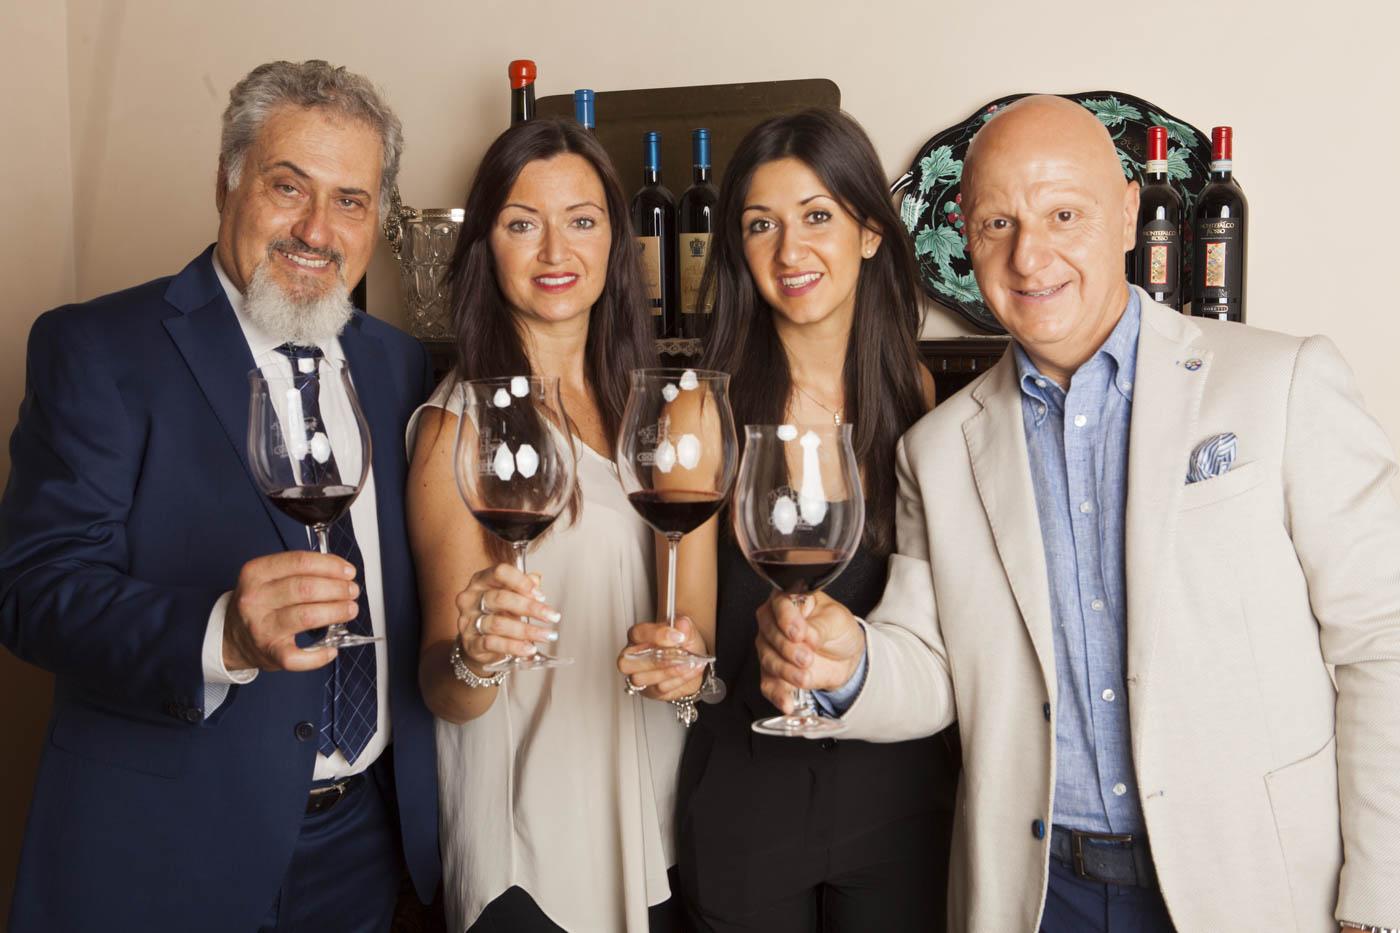 Le ultime due generazioni: Stefano, Sara Giulia e Gianluca